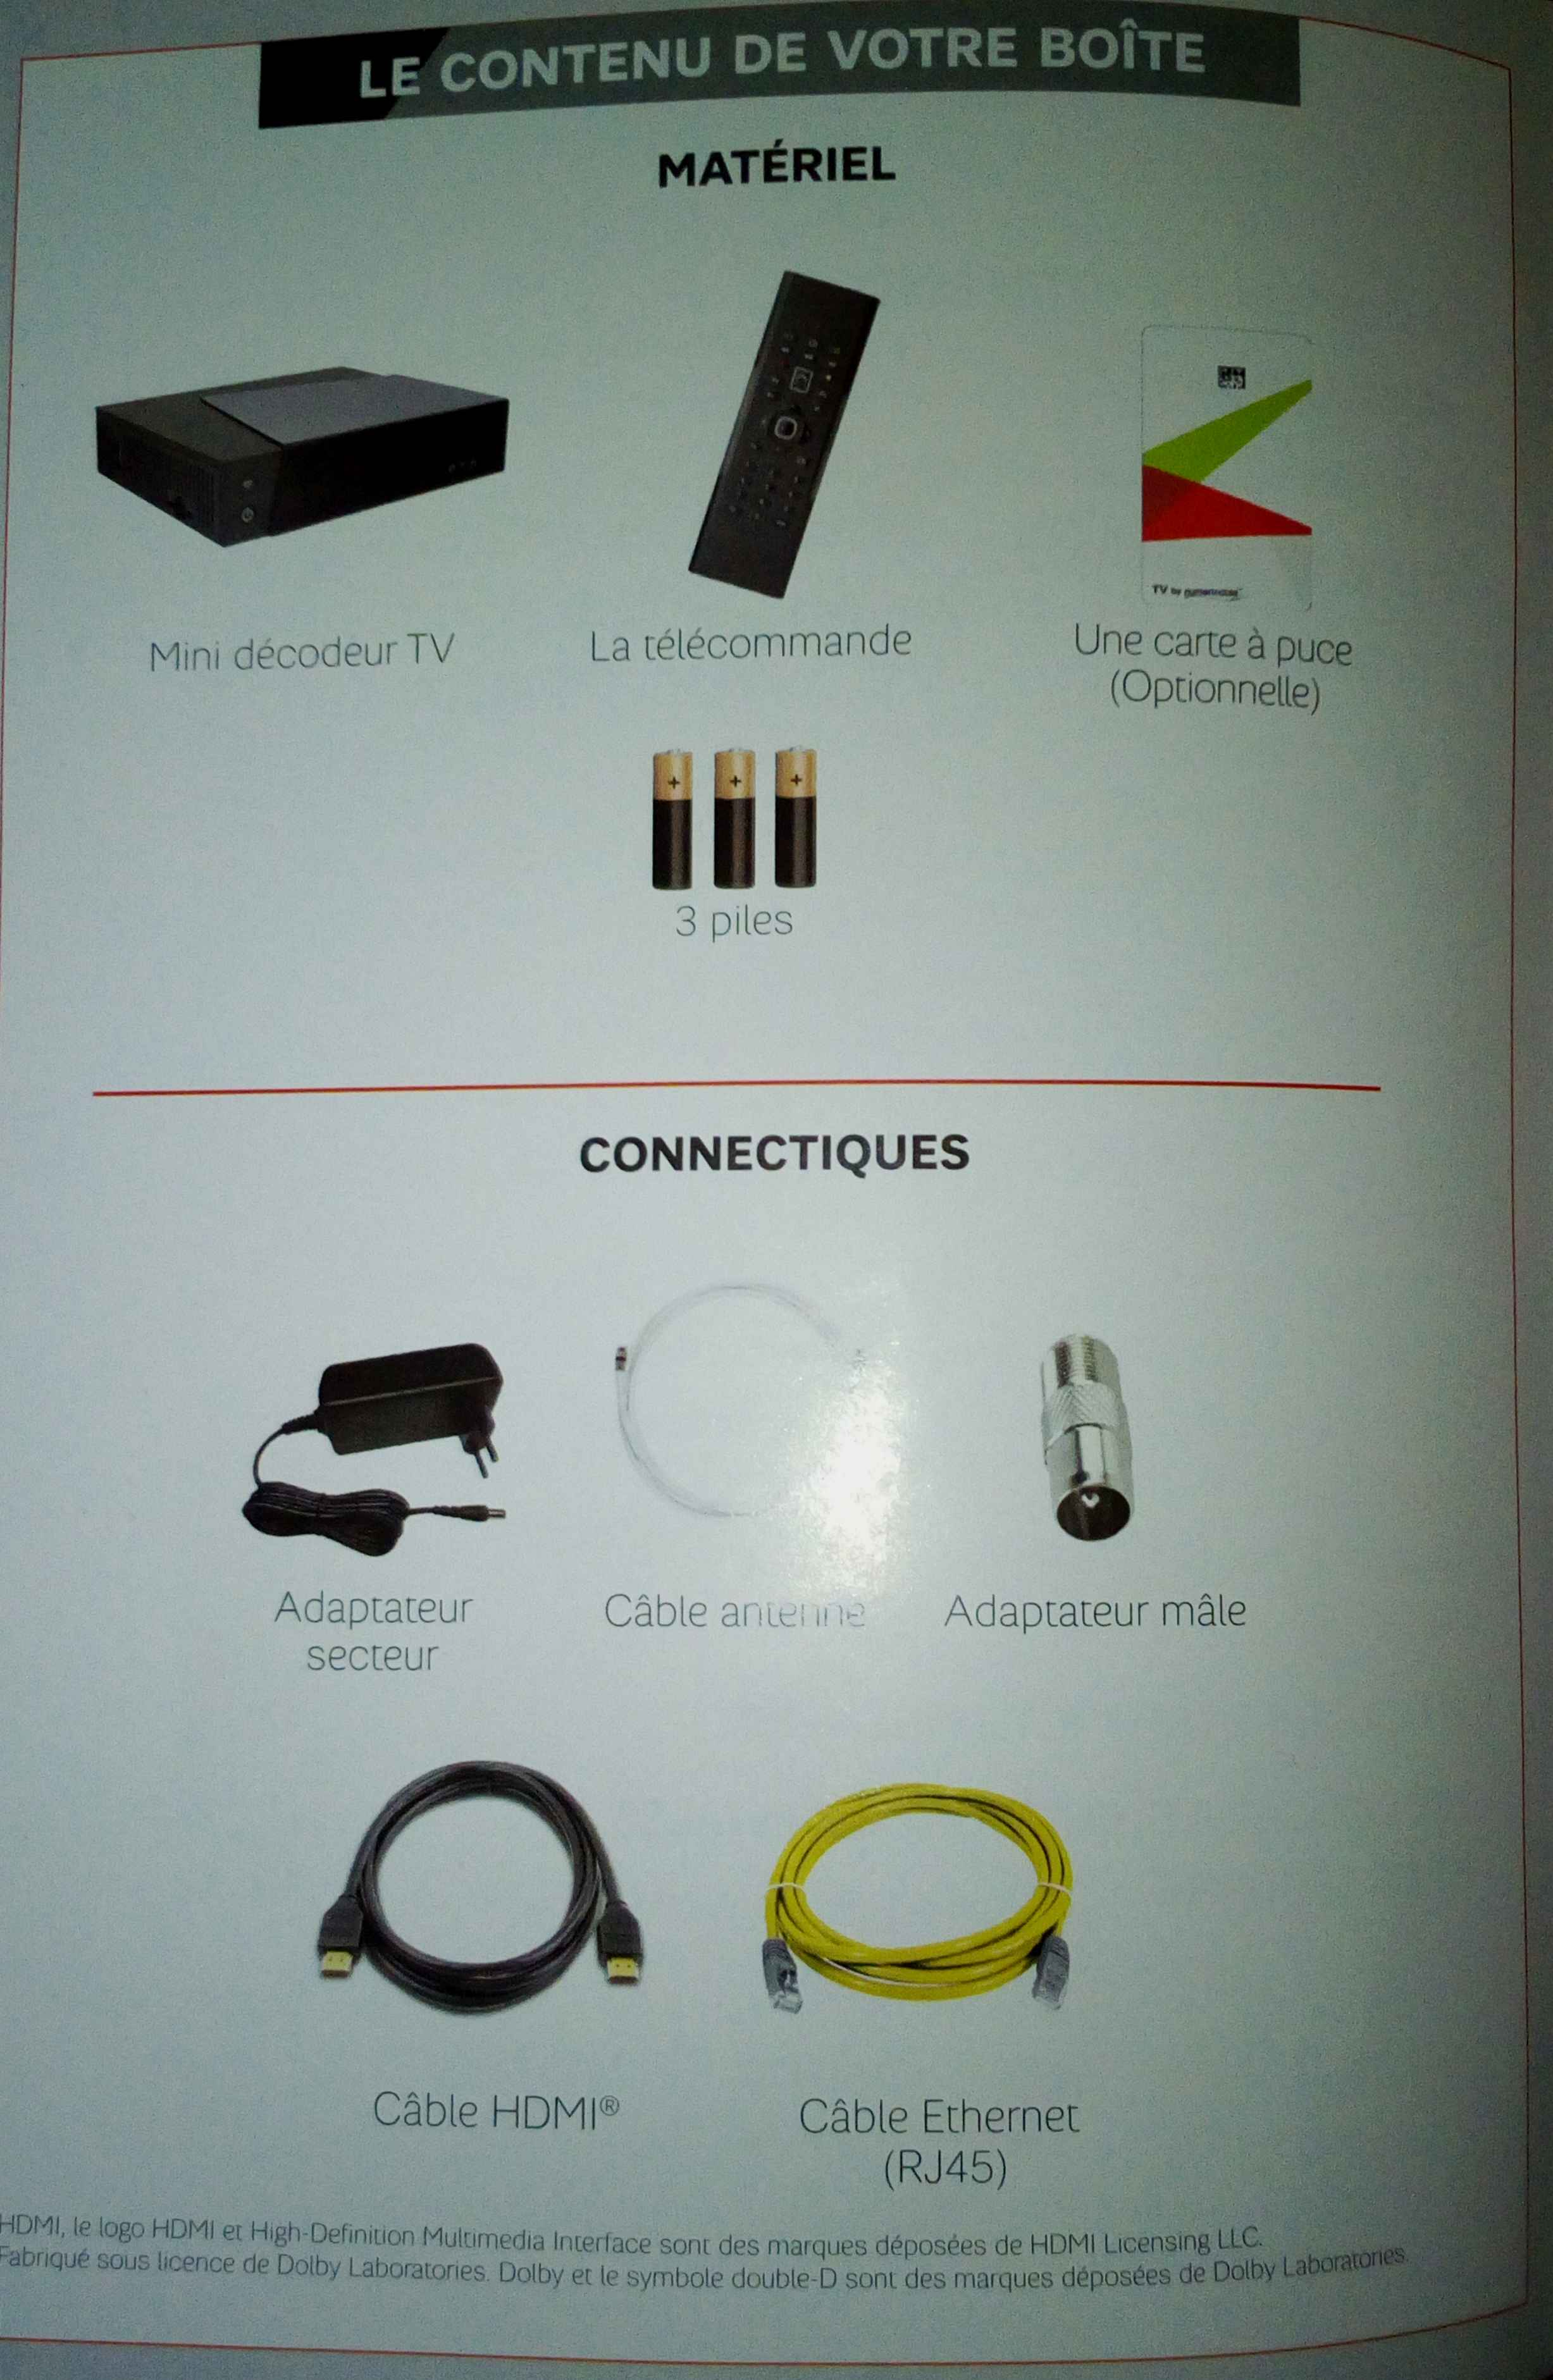 r solu red by sfr retours materiel liste assistance. Black Bedroom Furniture Sets. Home Design Ideas